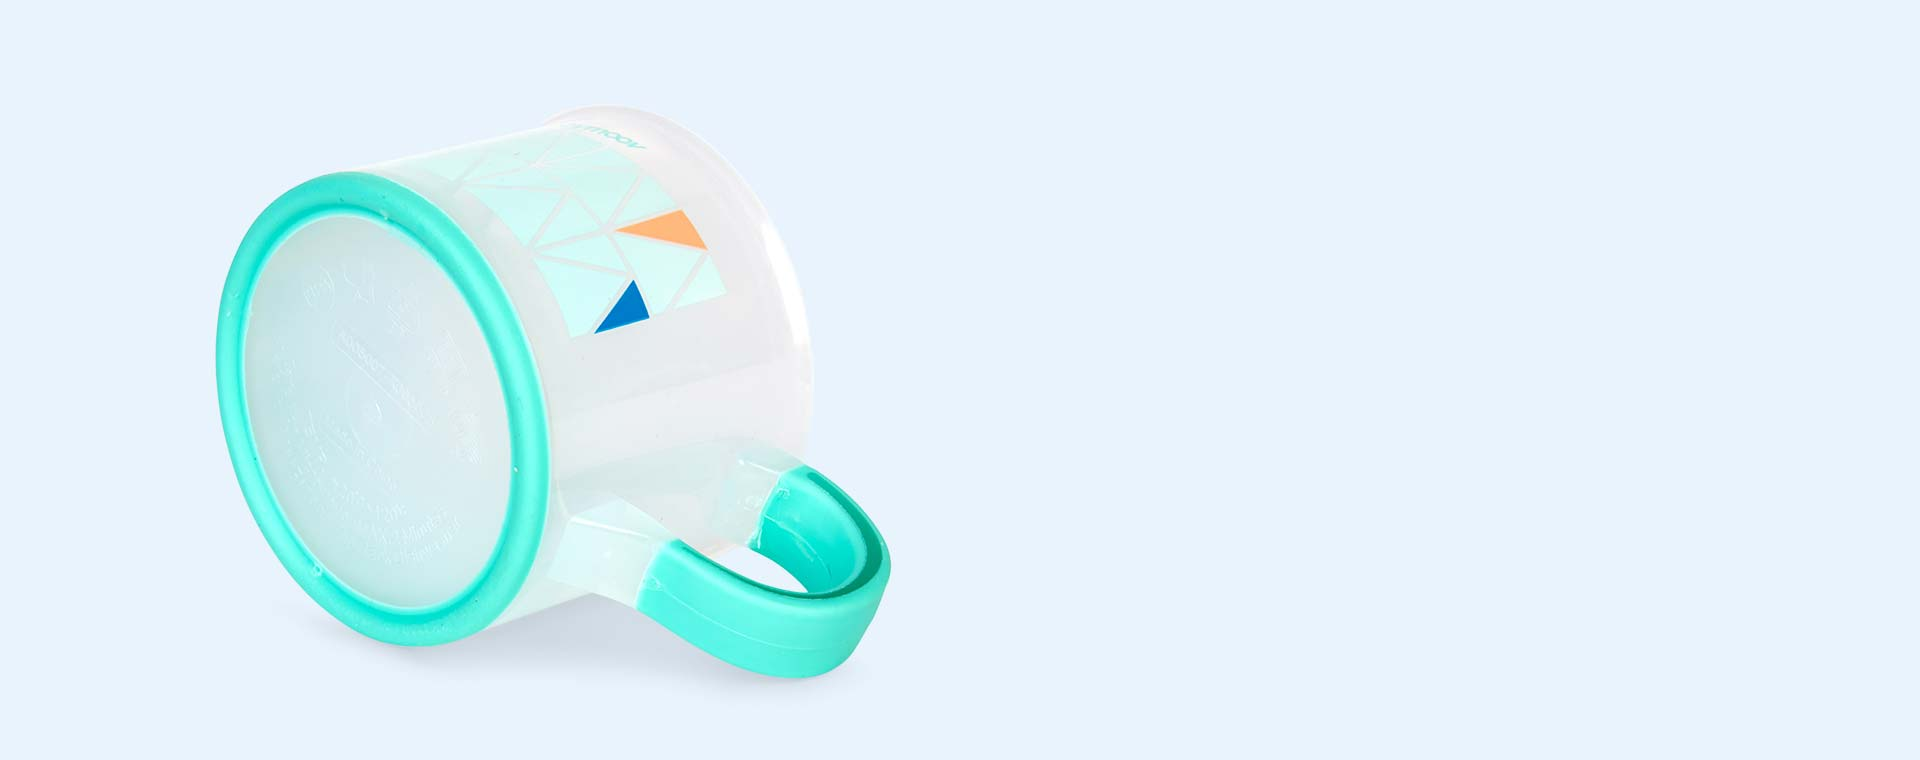 Blue Babymoov Non-Slip Cup